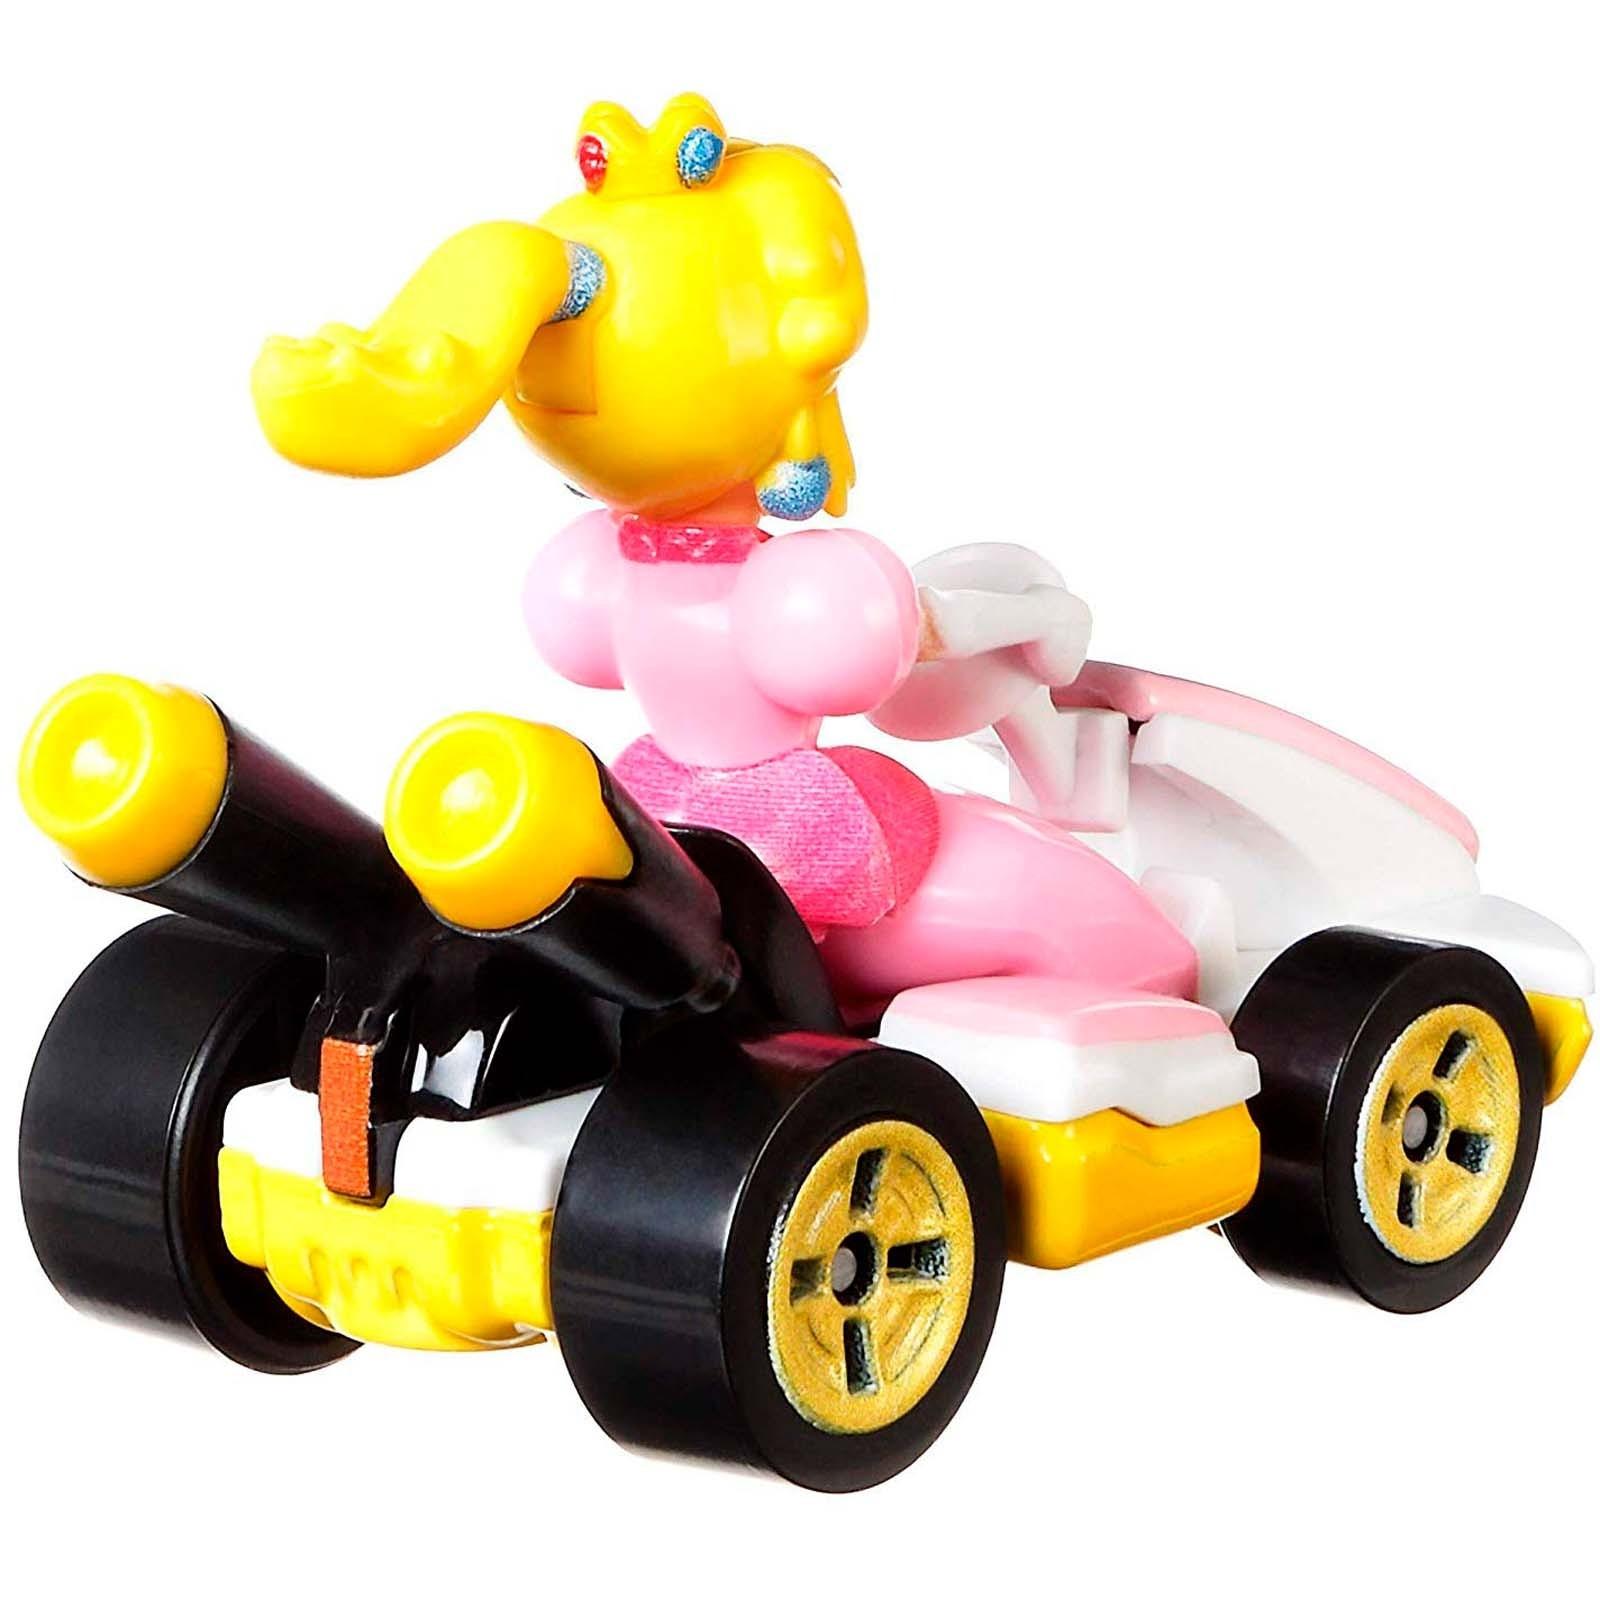 Hot Wheels - Peach Standard Kart - Mario Kart - GBG28